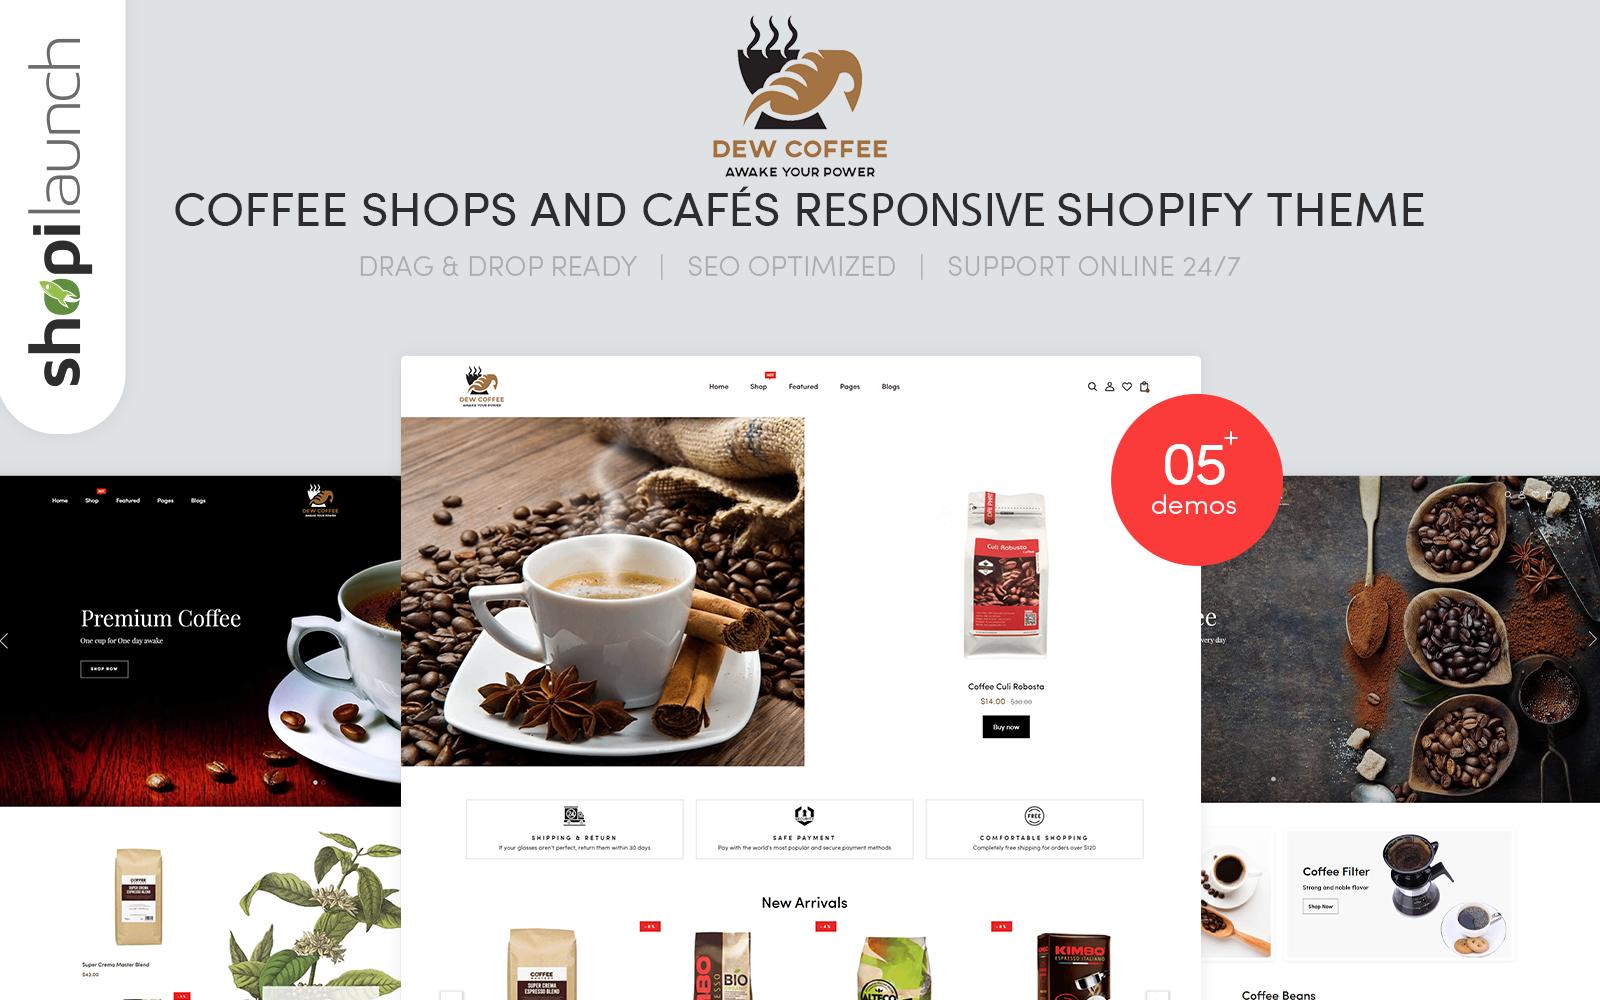 DewCoffee - Coffee Shops & Cafes Responsive Shopify Theme